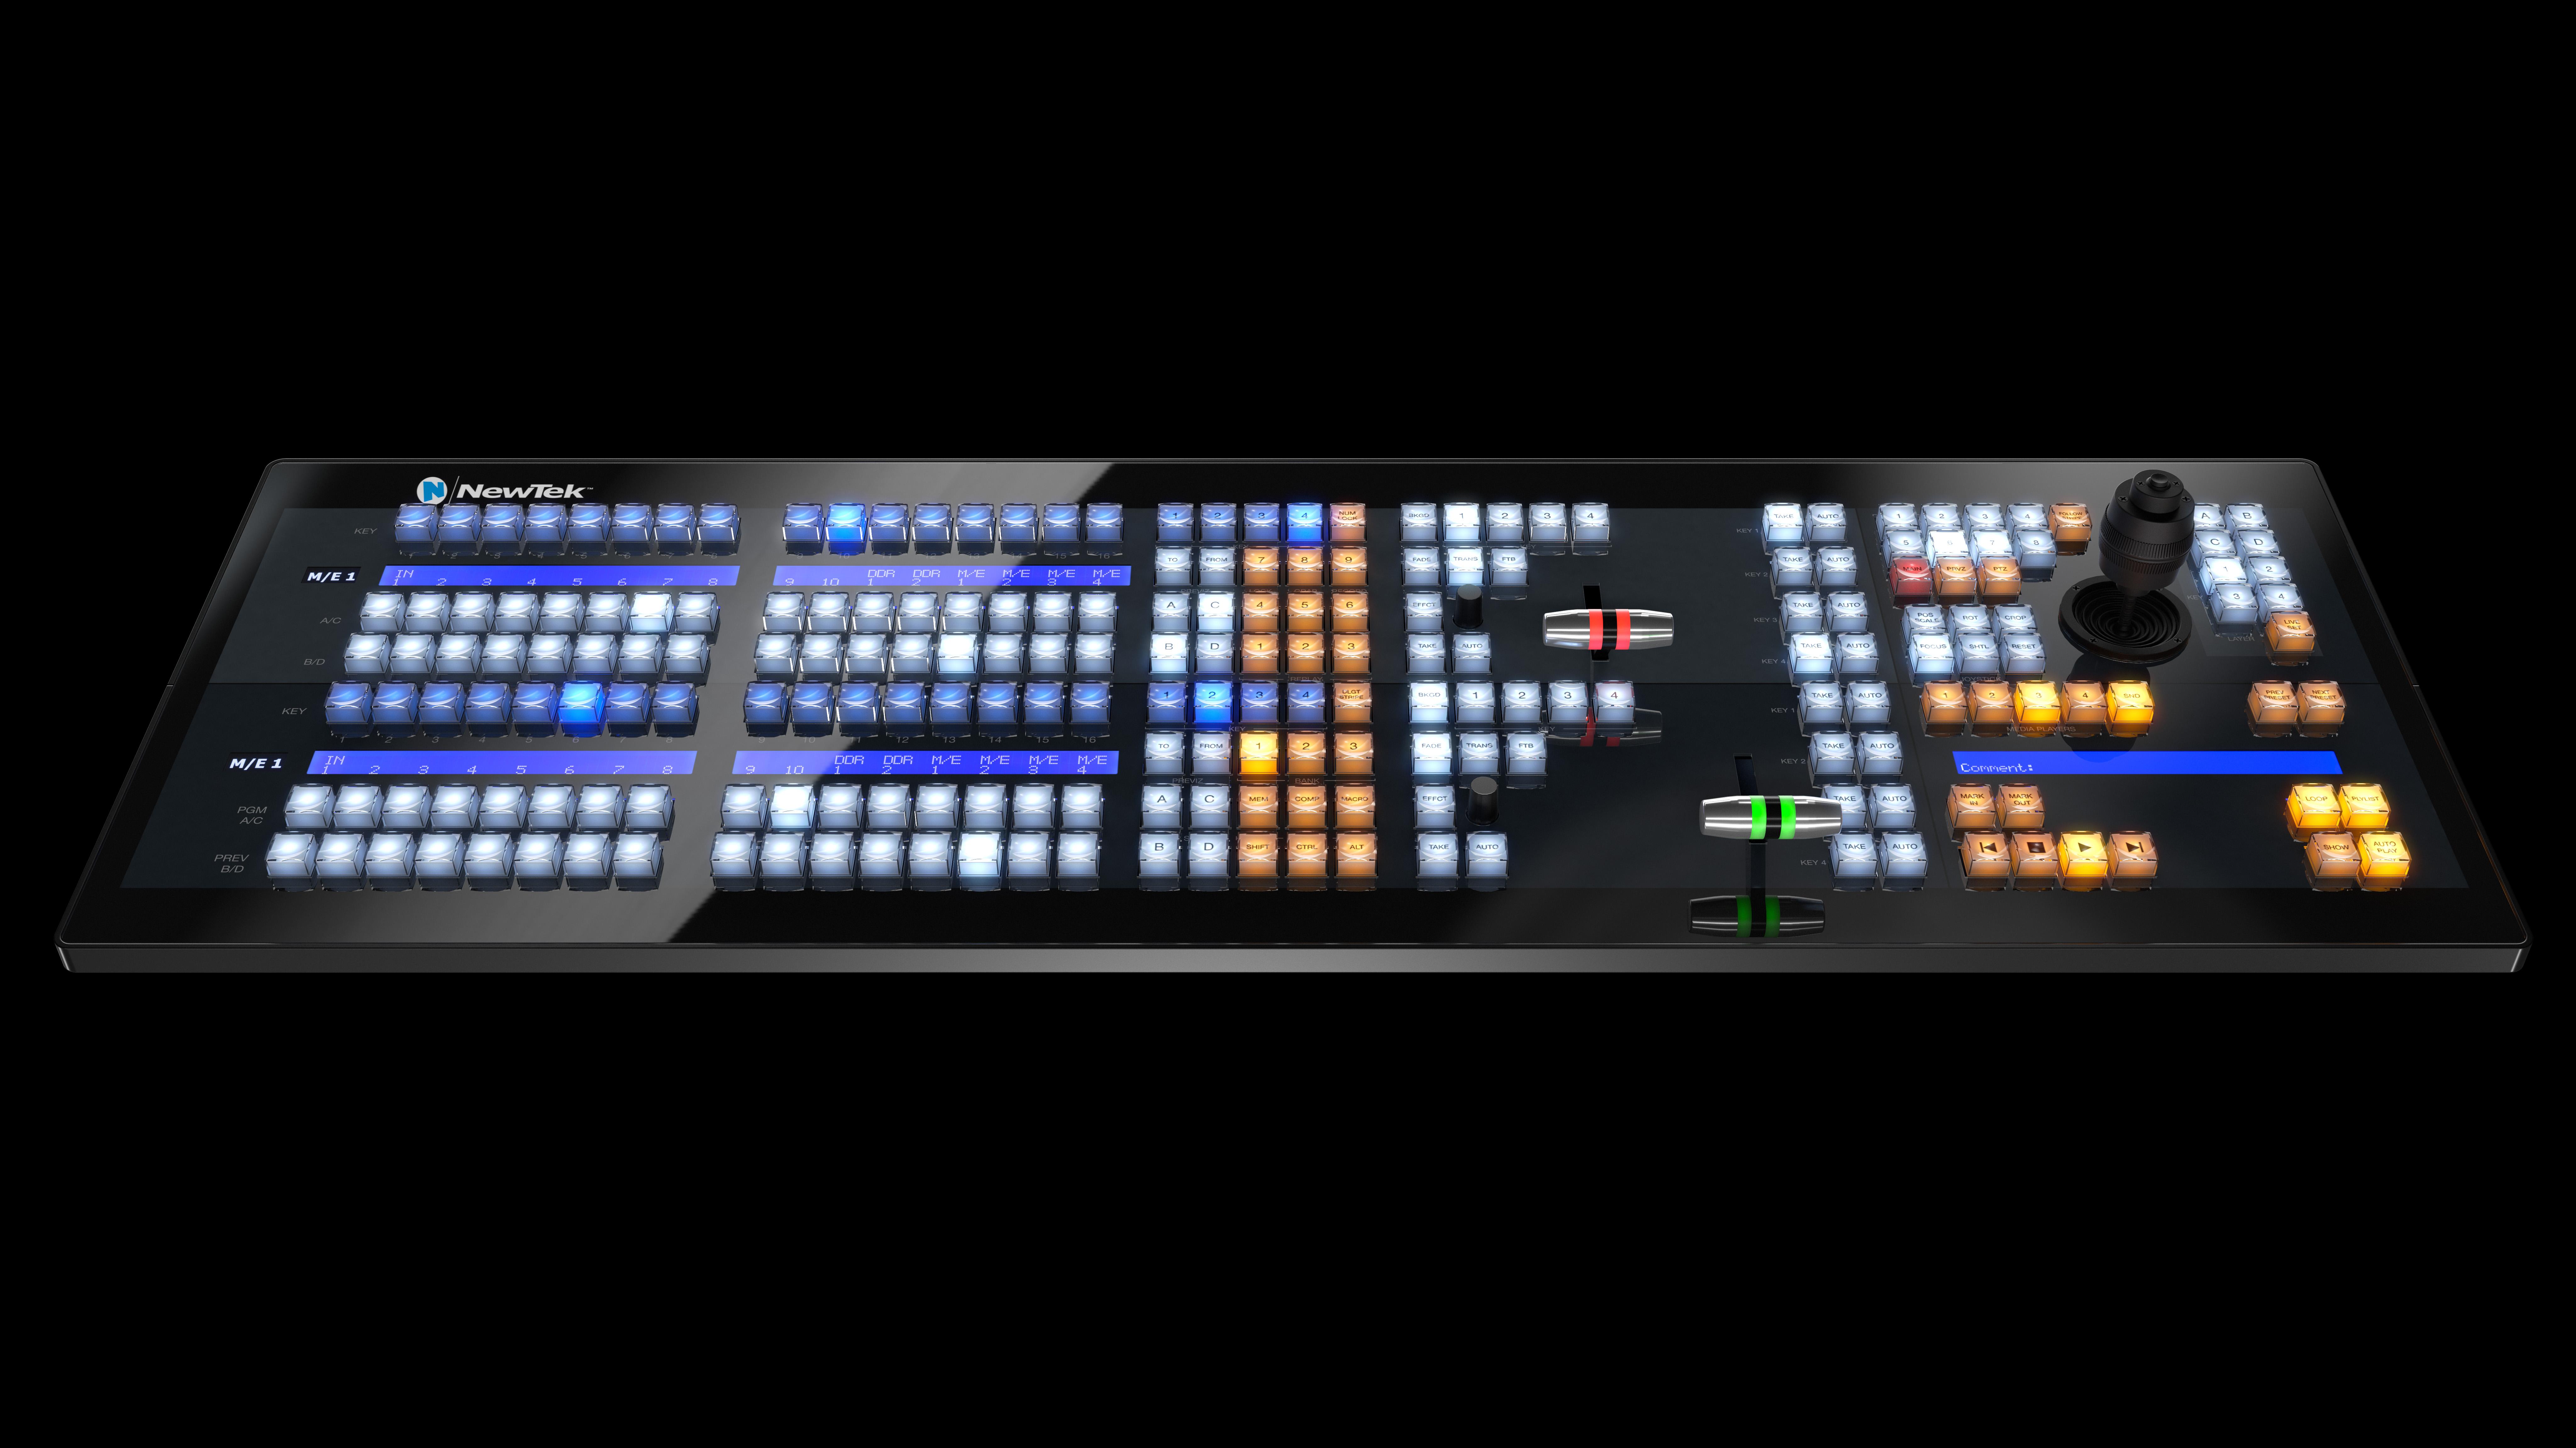 2 Stripe Control Panel